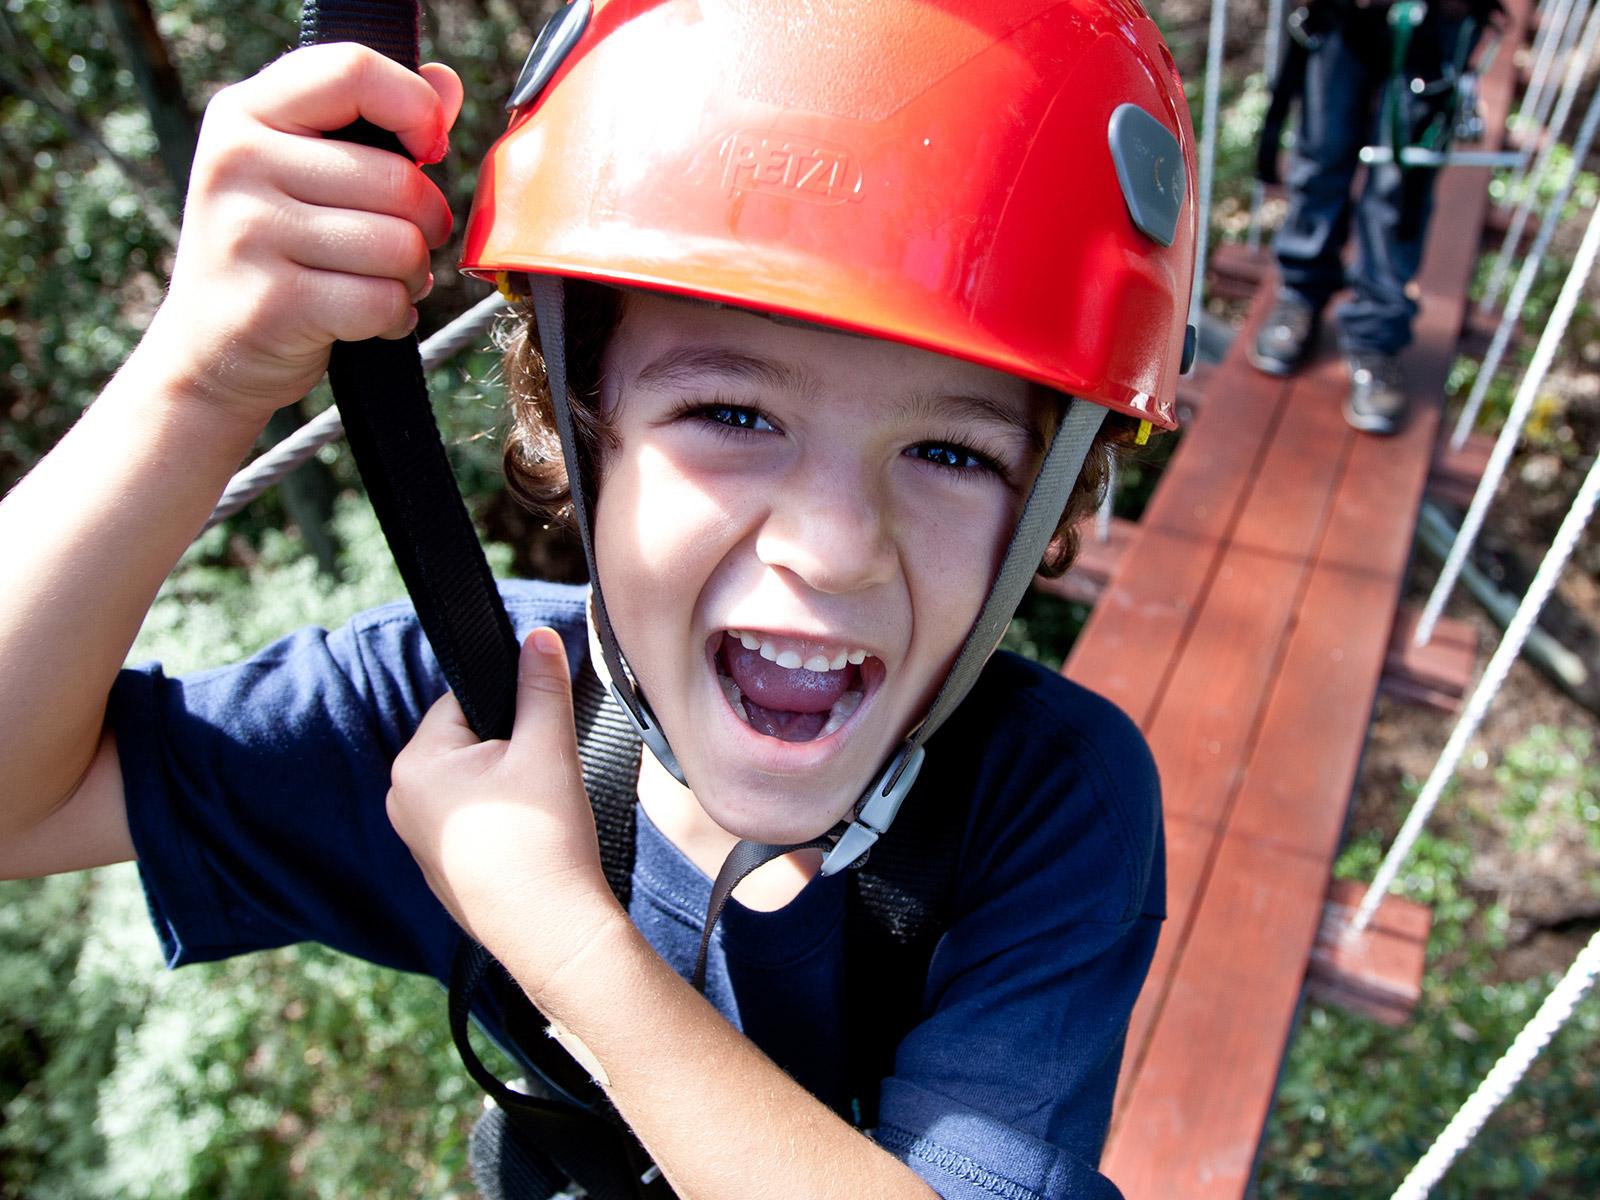 Upcounty Canopy 6 Line Zipline